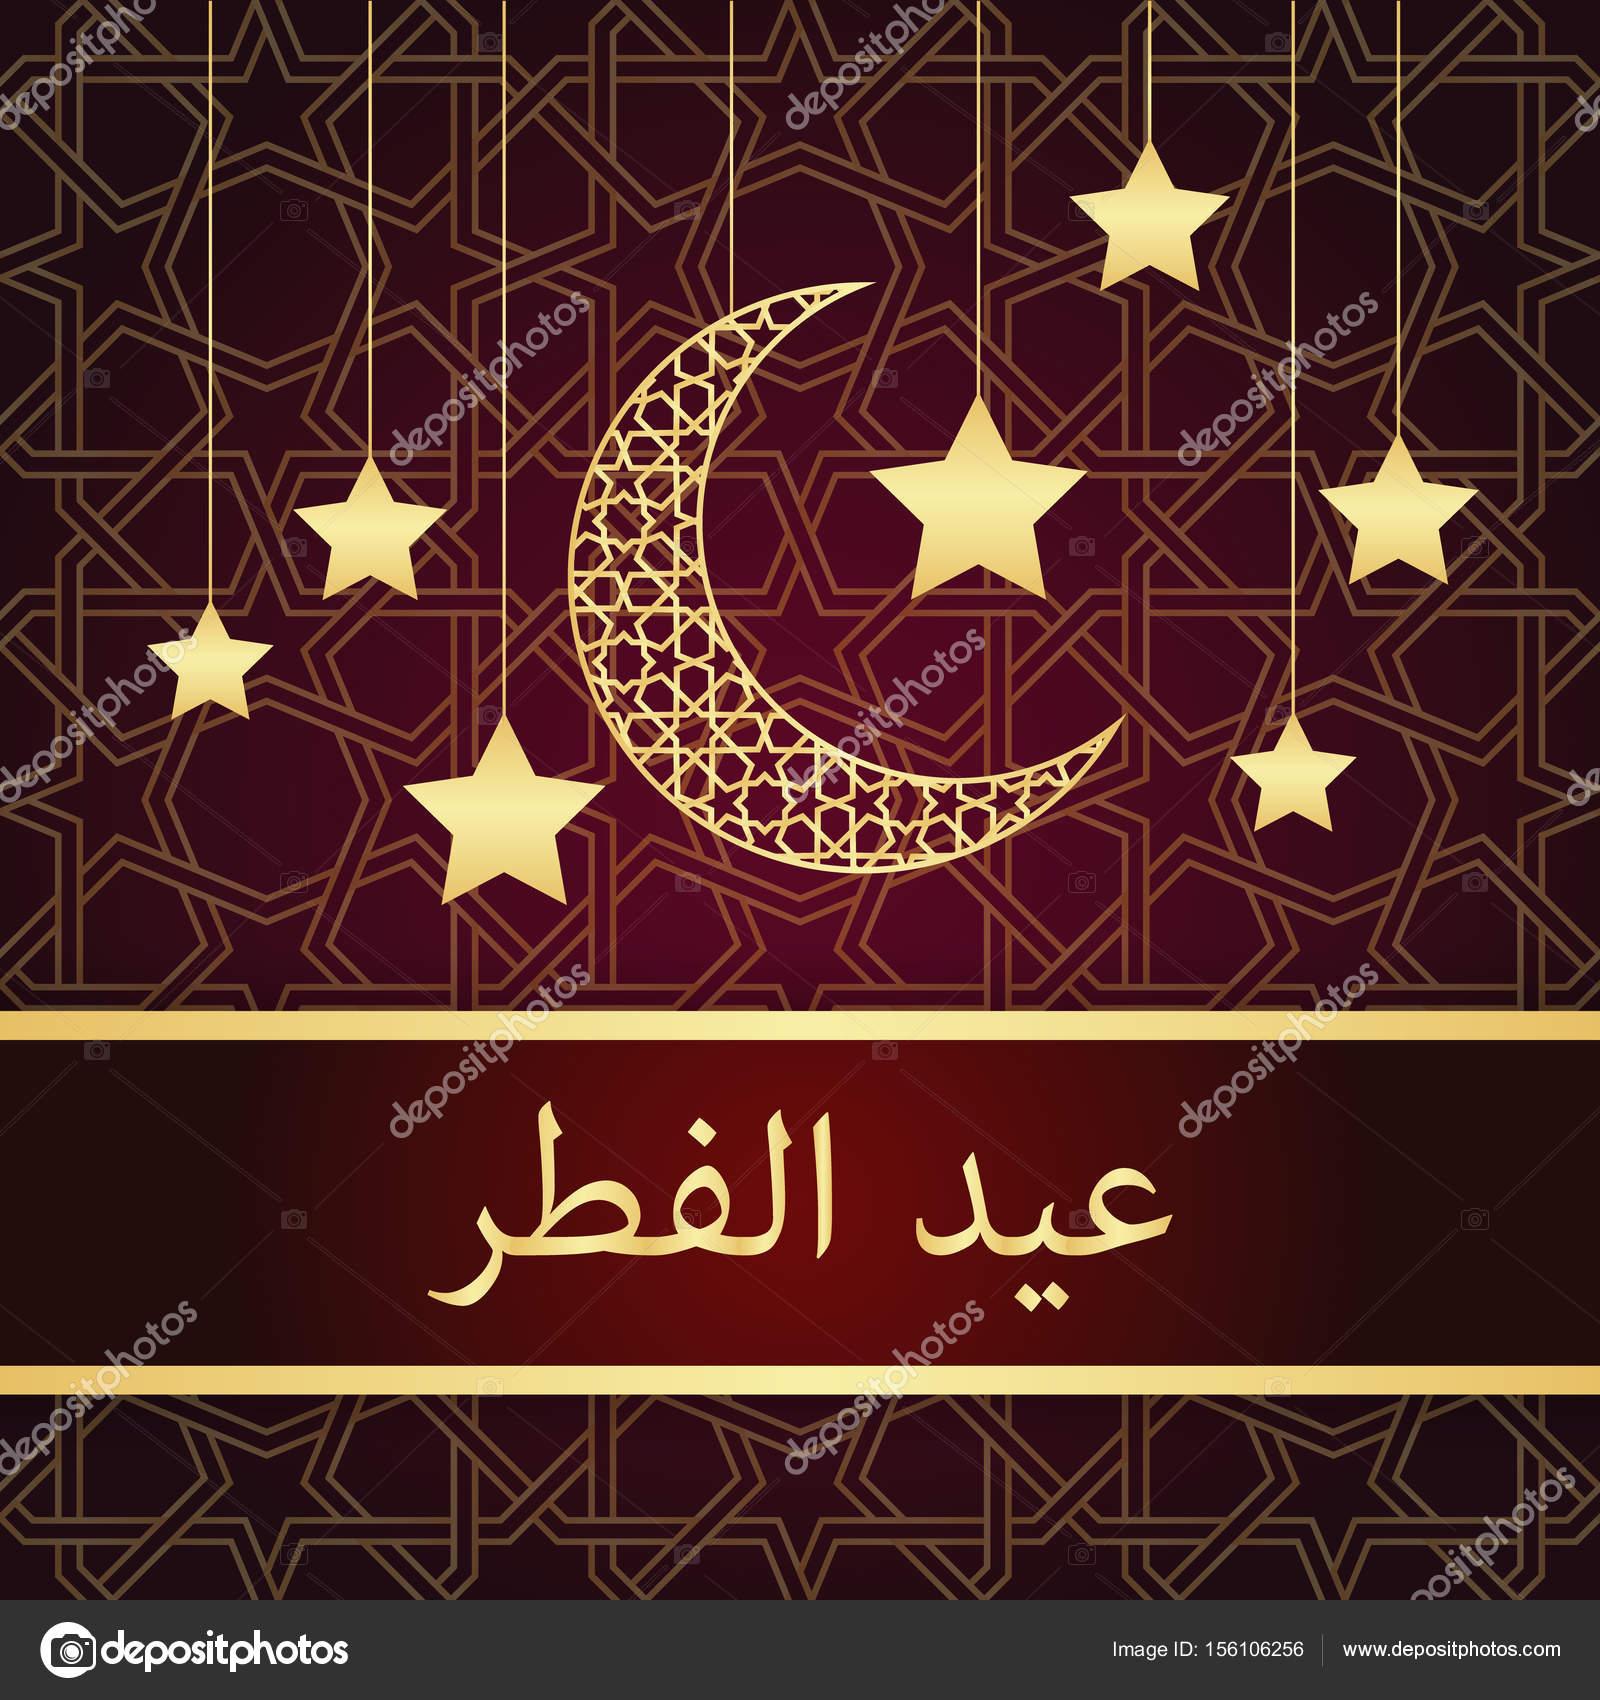 Best Idd Eid Al-Fitr Greeting - depositphotos_156106256-stock-illustration-eid-al-fitr-greeting-card  Photograph_165158 .jpg